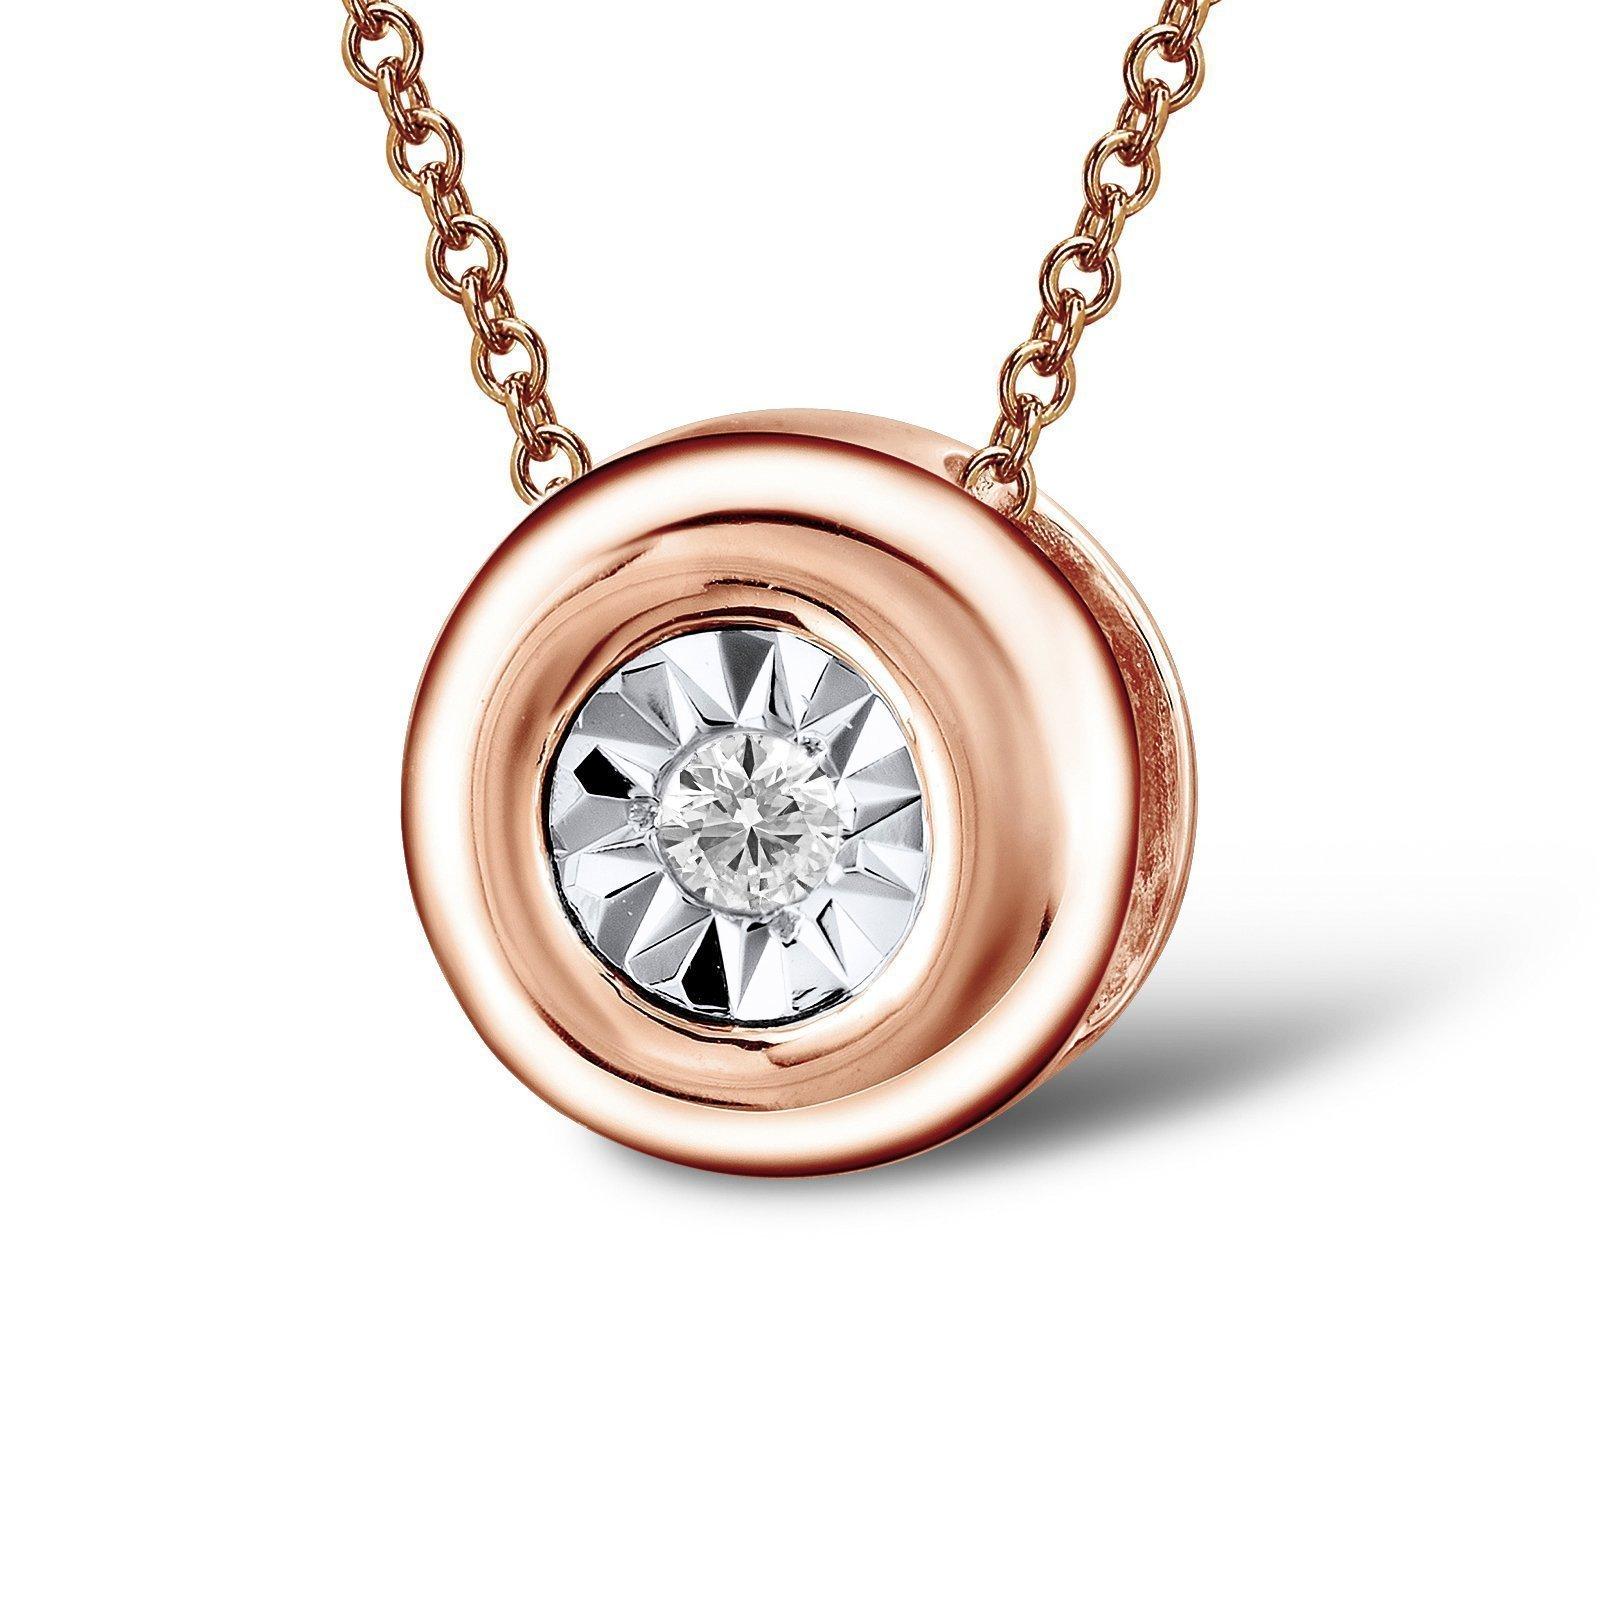 Кулон из красного золота Сабрина с бриллиантом